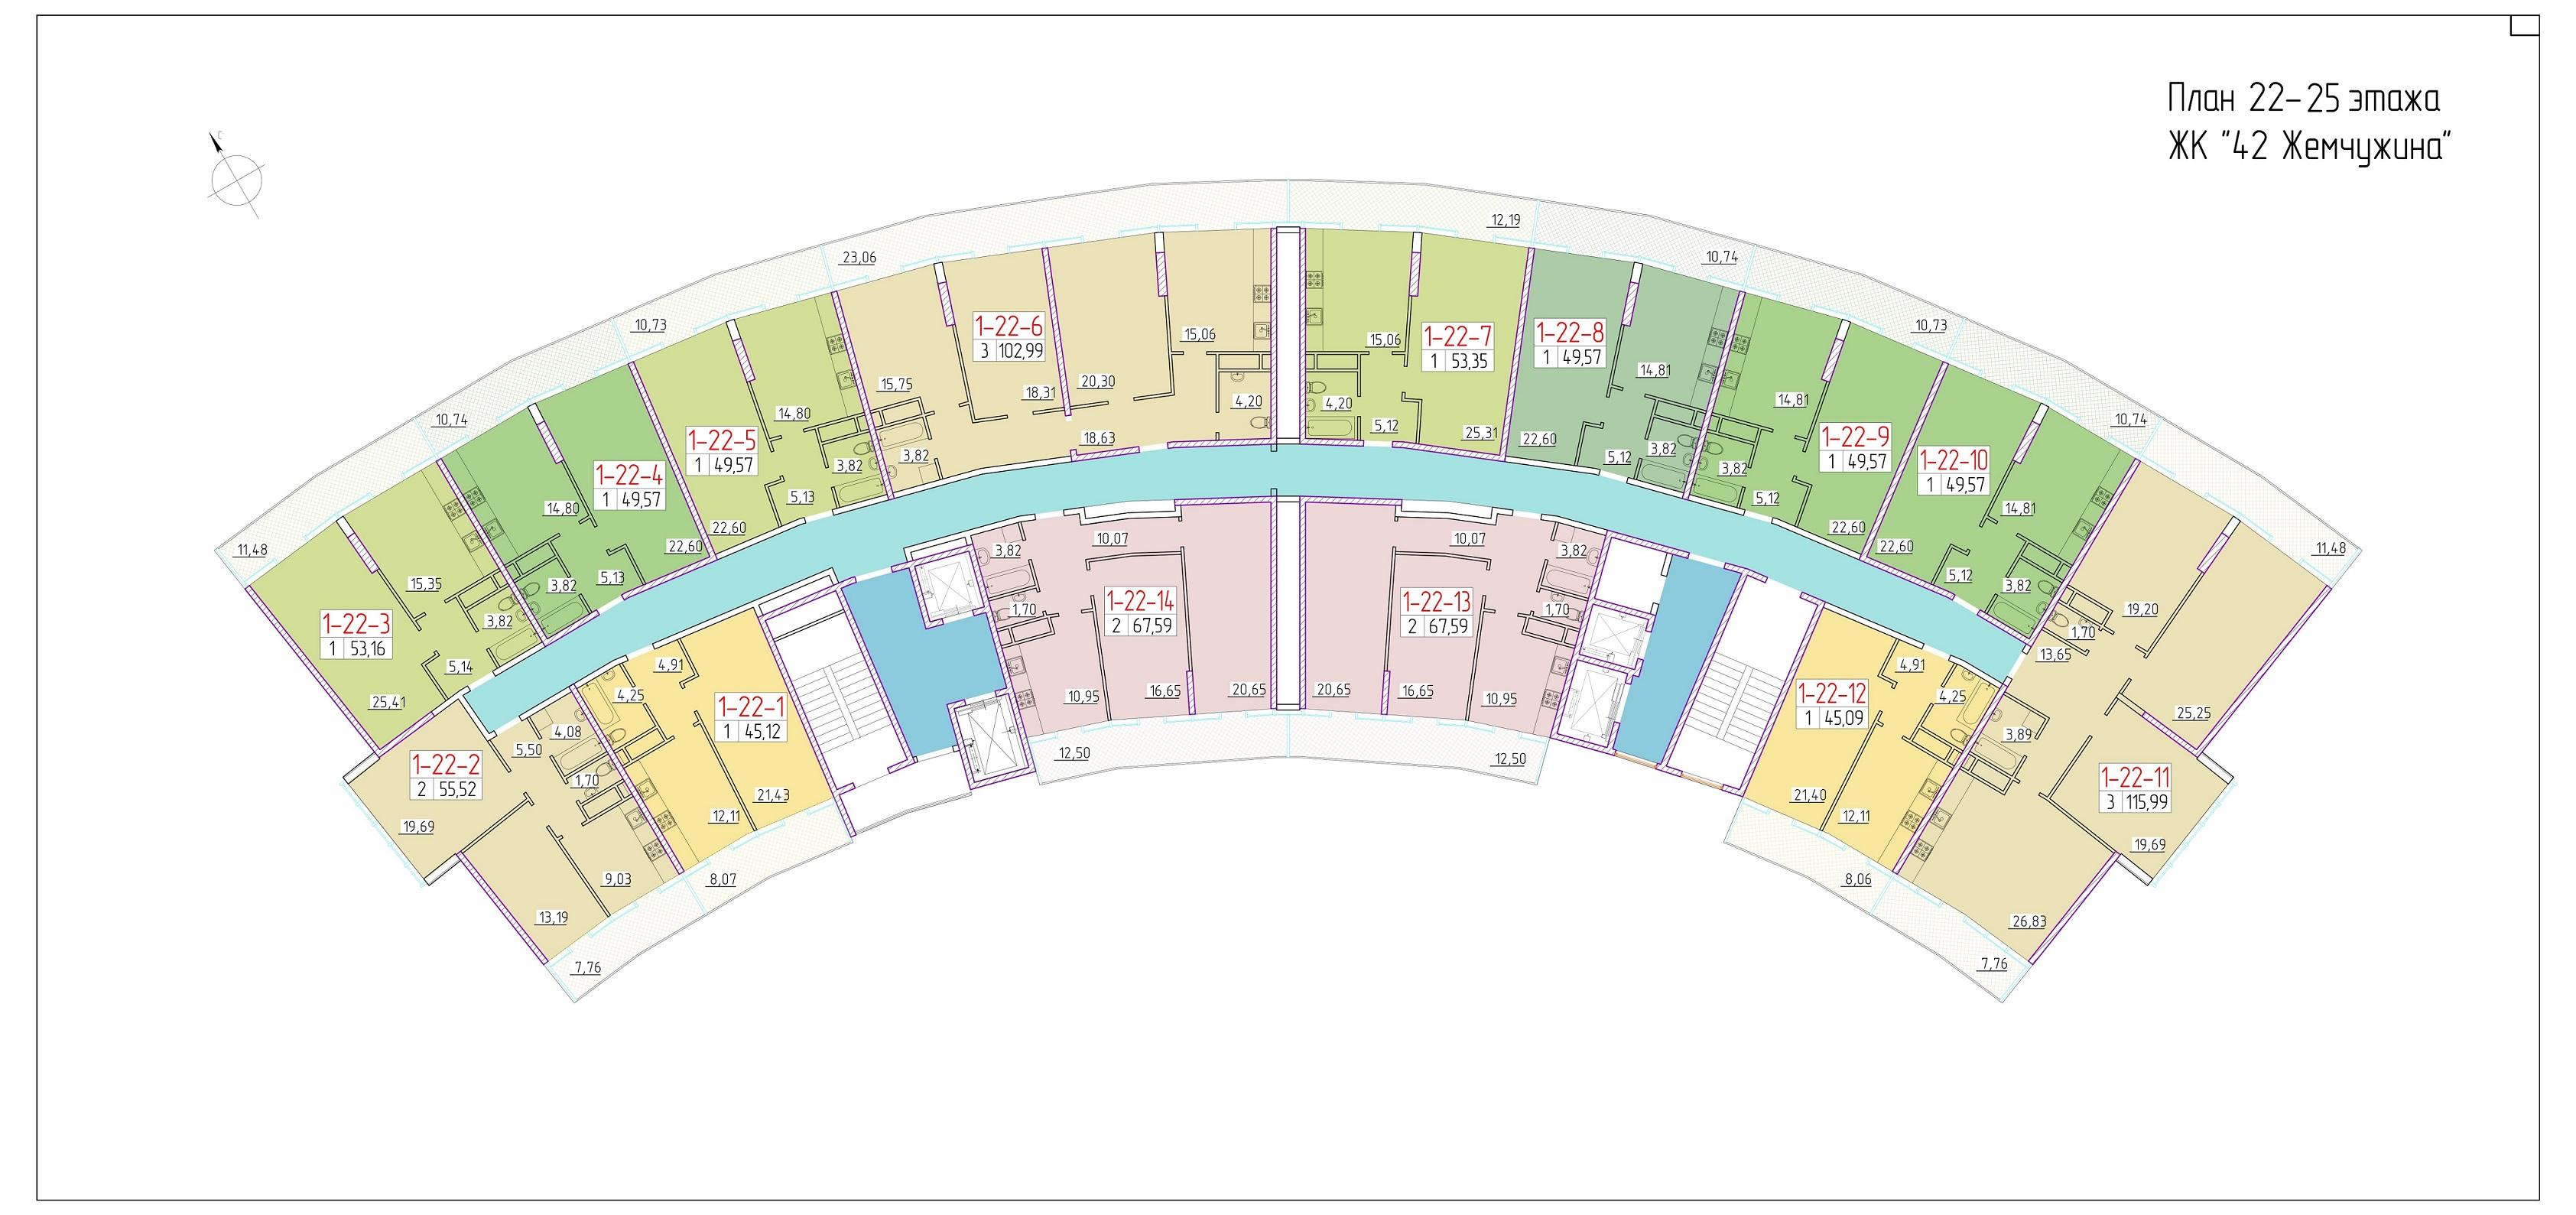 ЖК 42 Жемчужина План 22-25 этажа